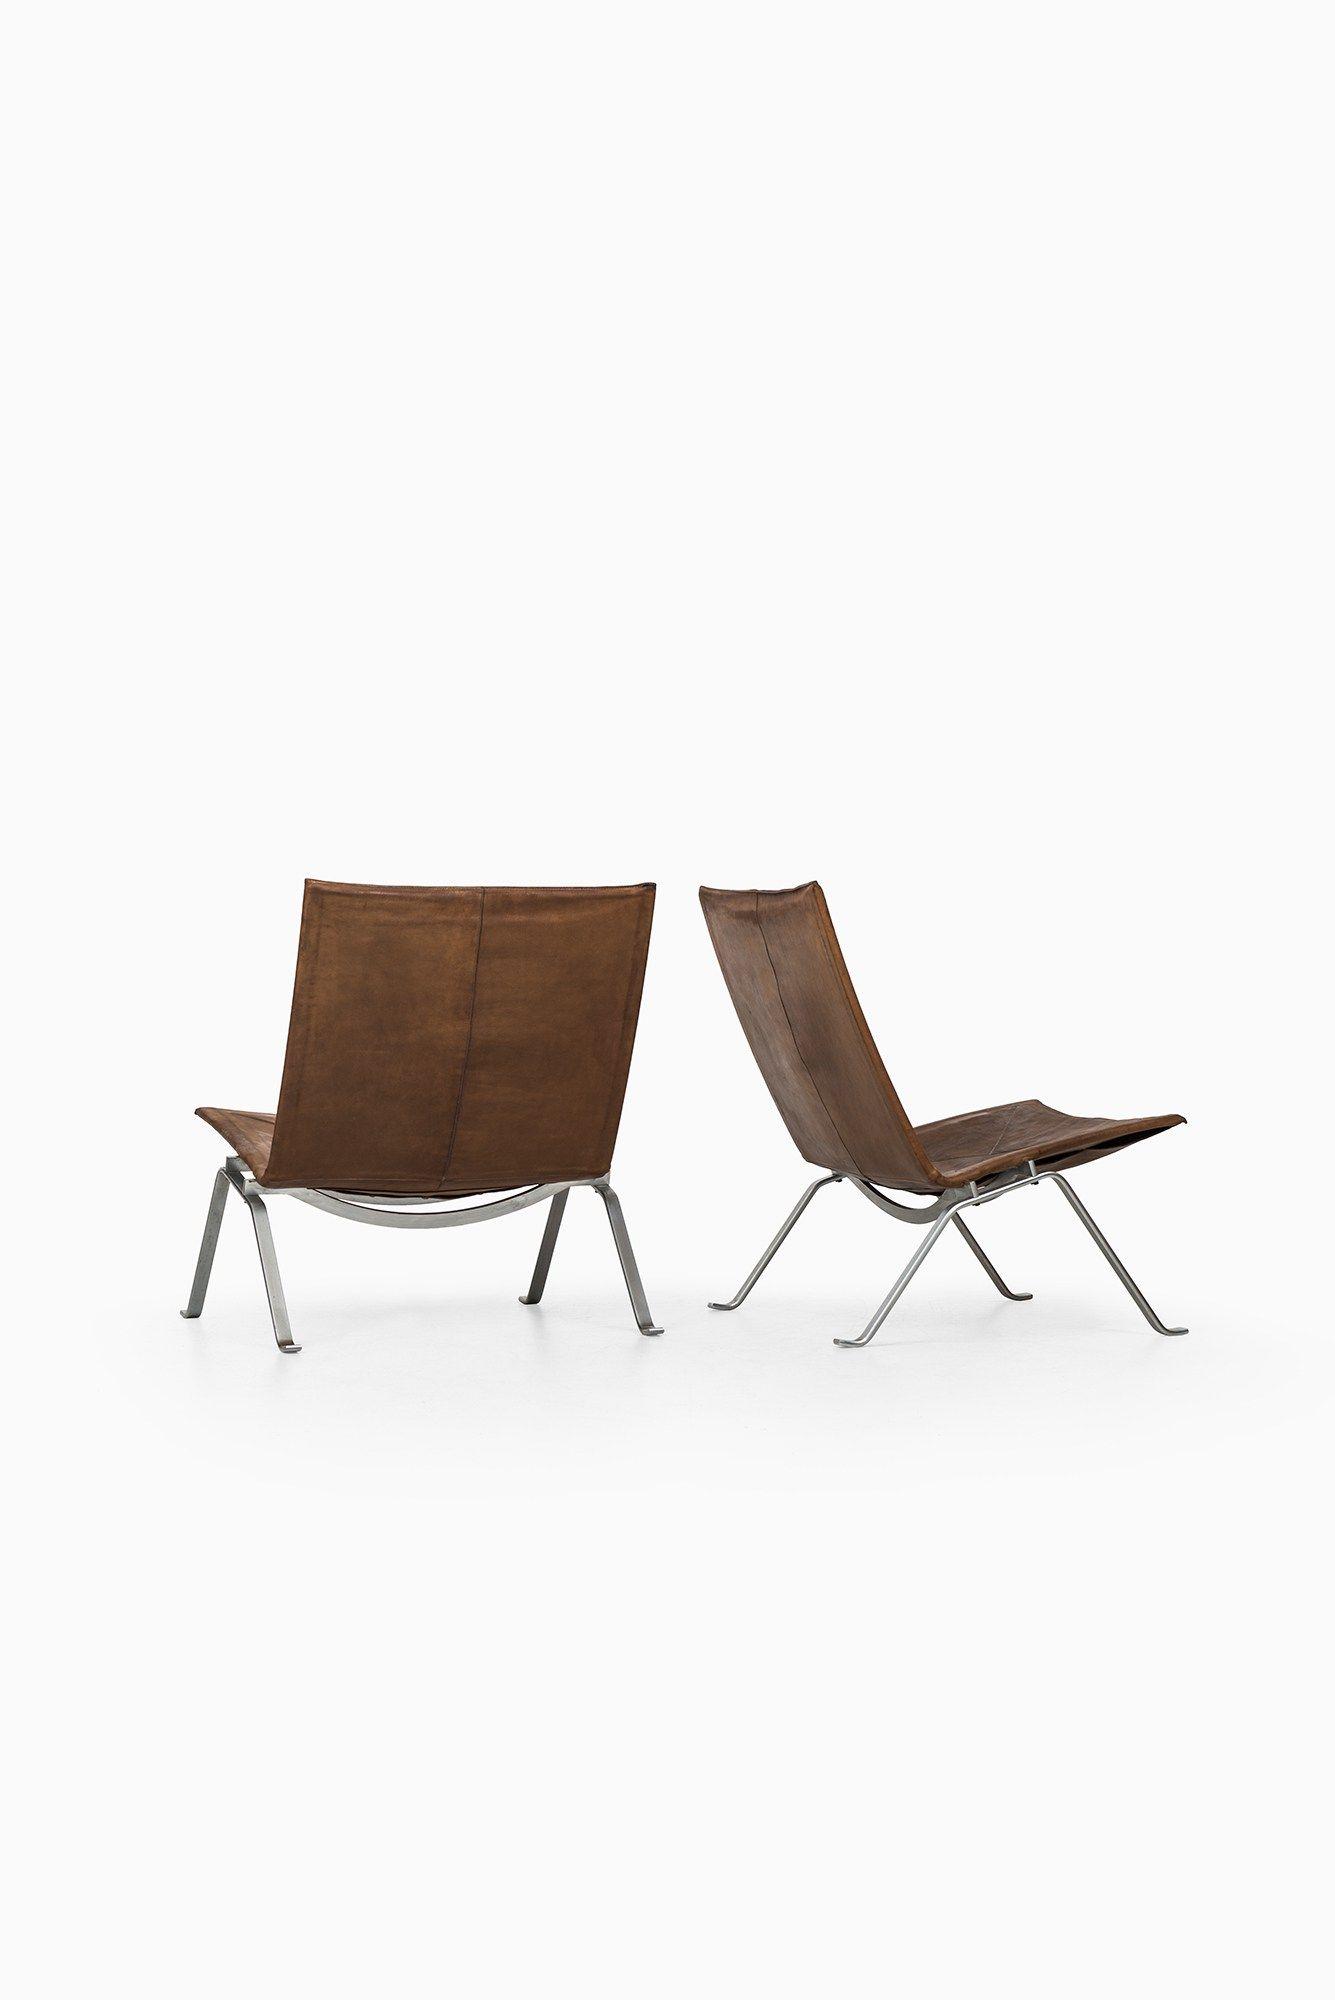 Poul kjærholm pk easy chairs at studio schalling studio